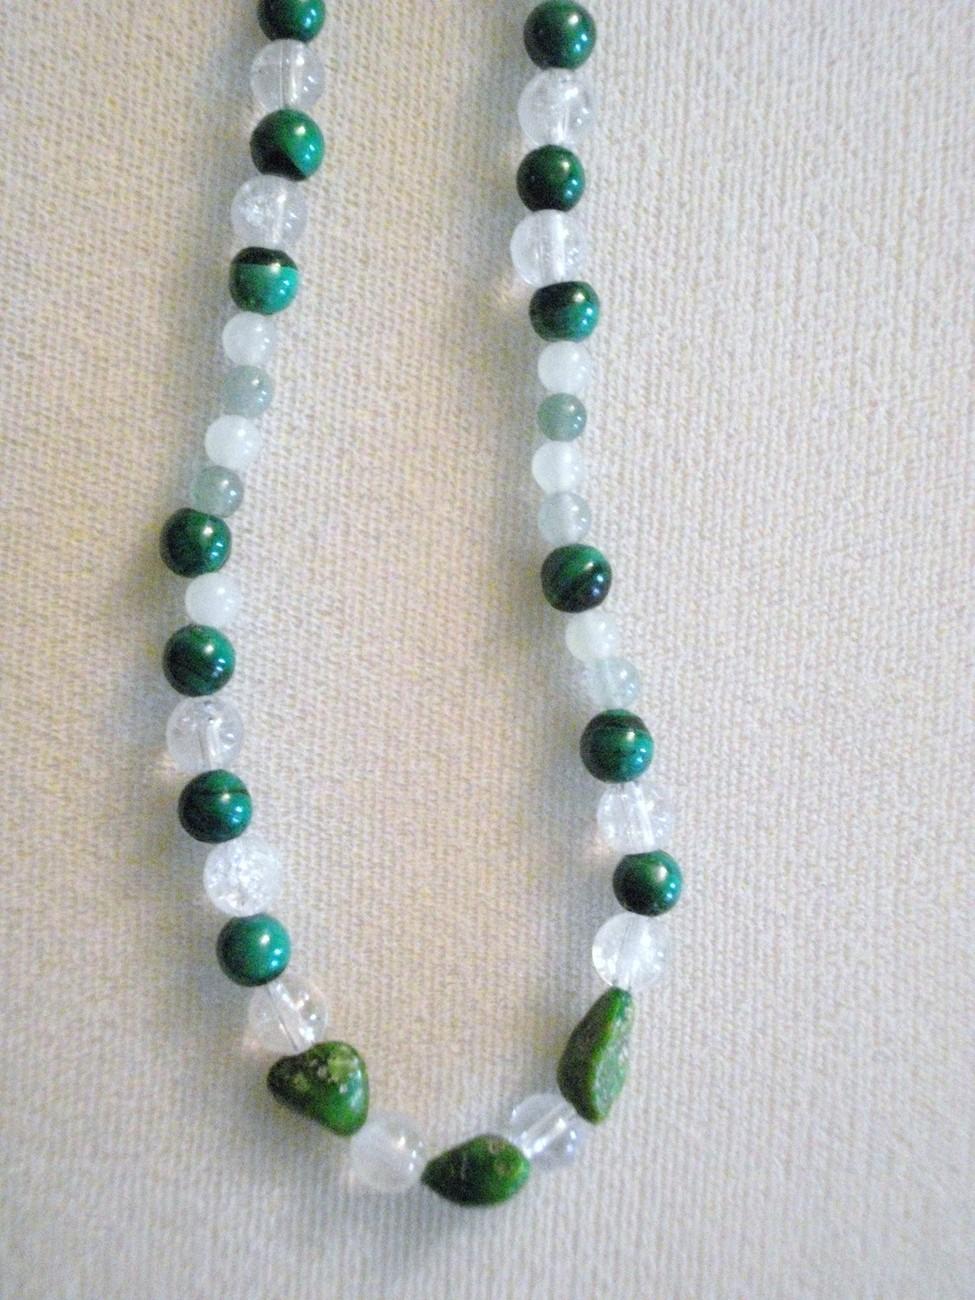 Crystal Quartz, Green Adventurine, New Jade, Green Malachite